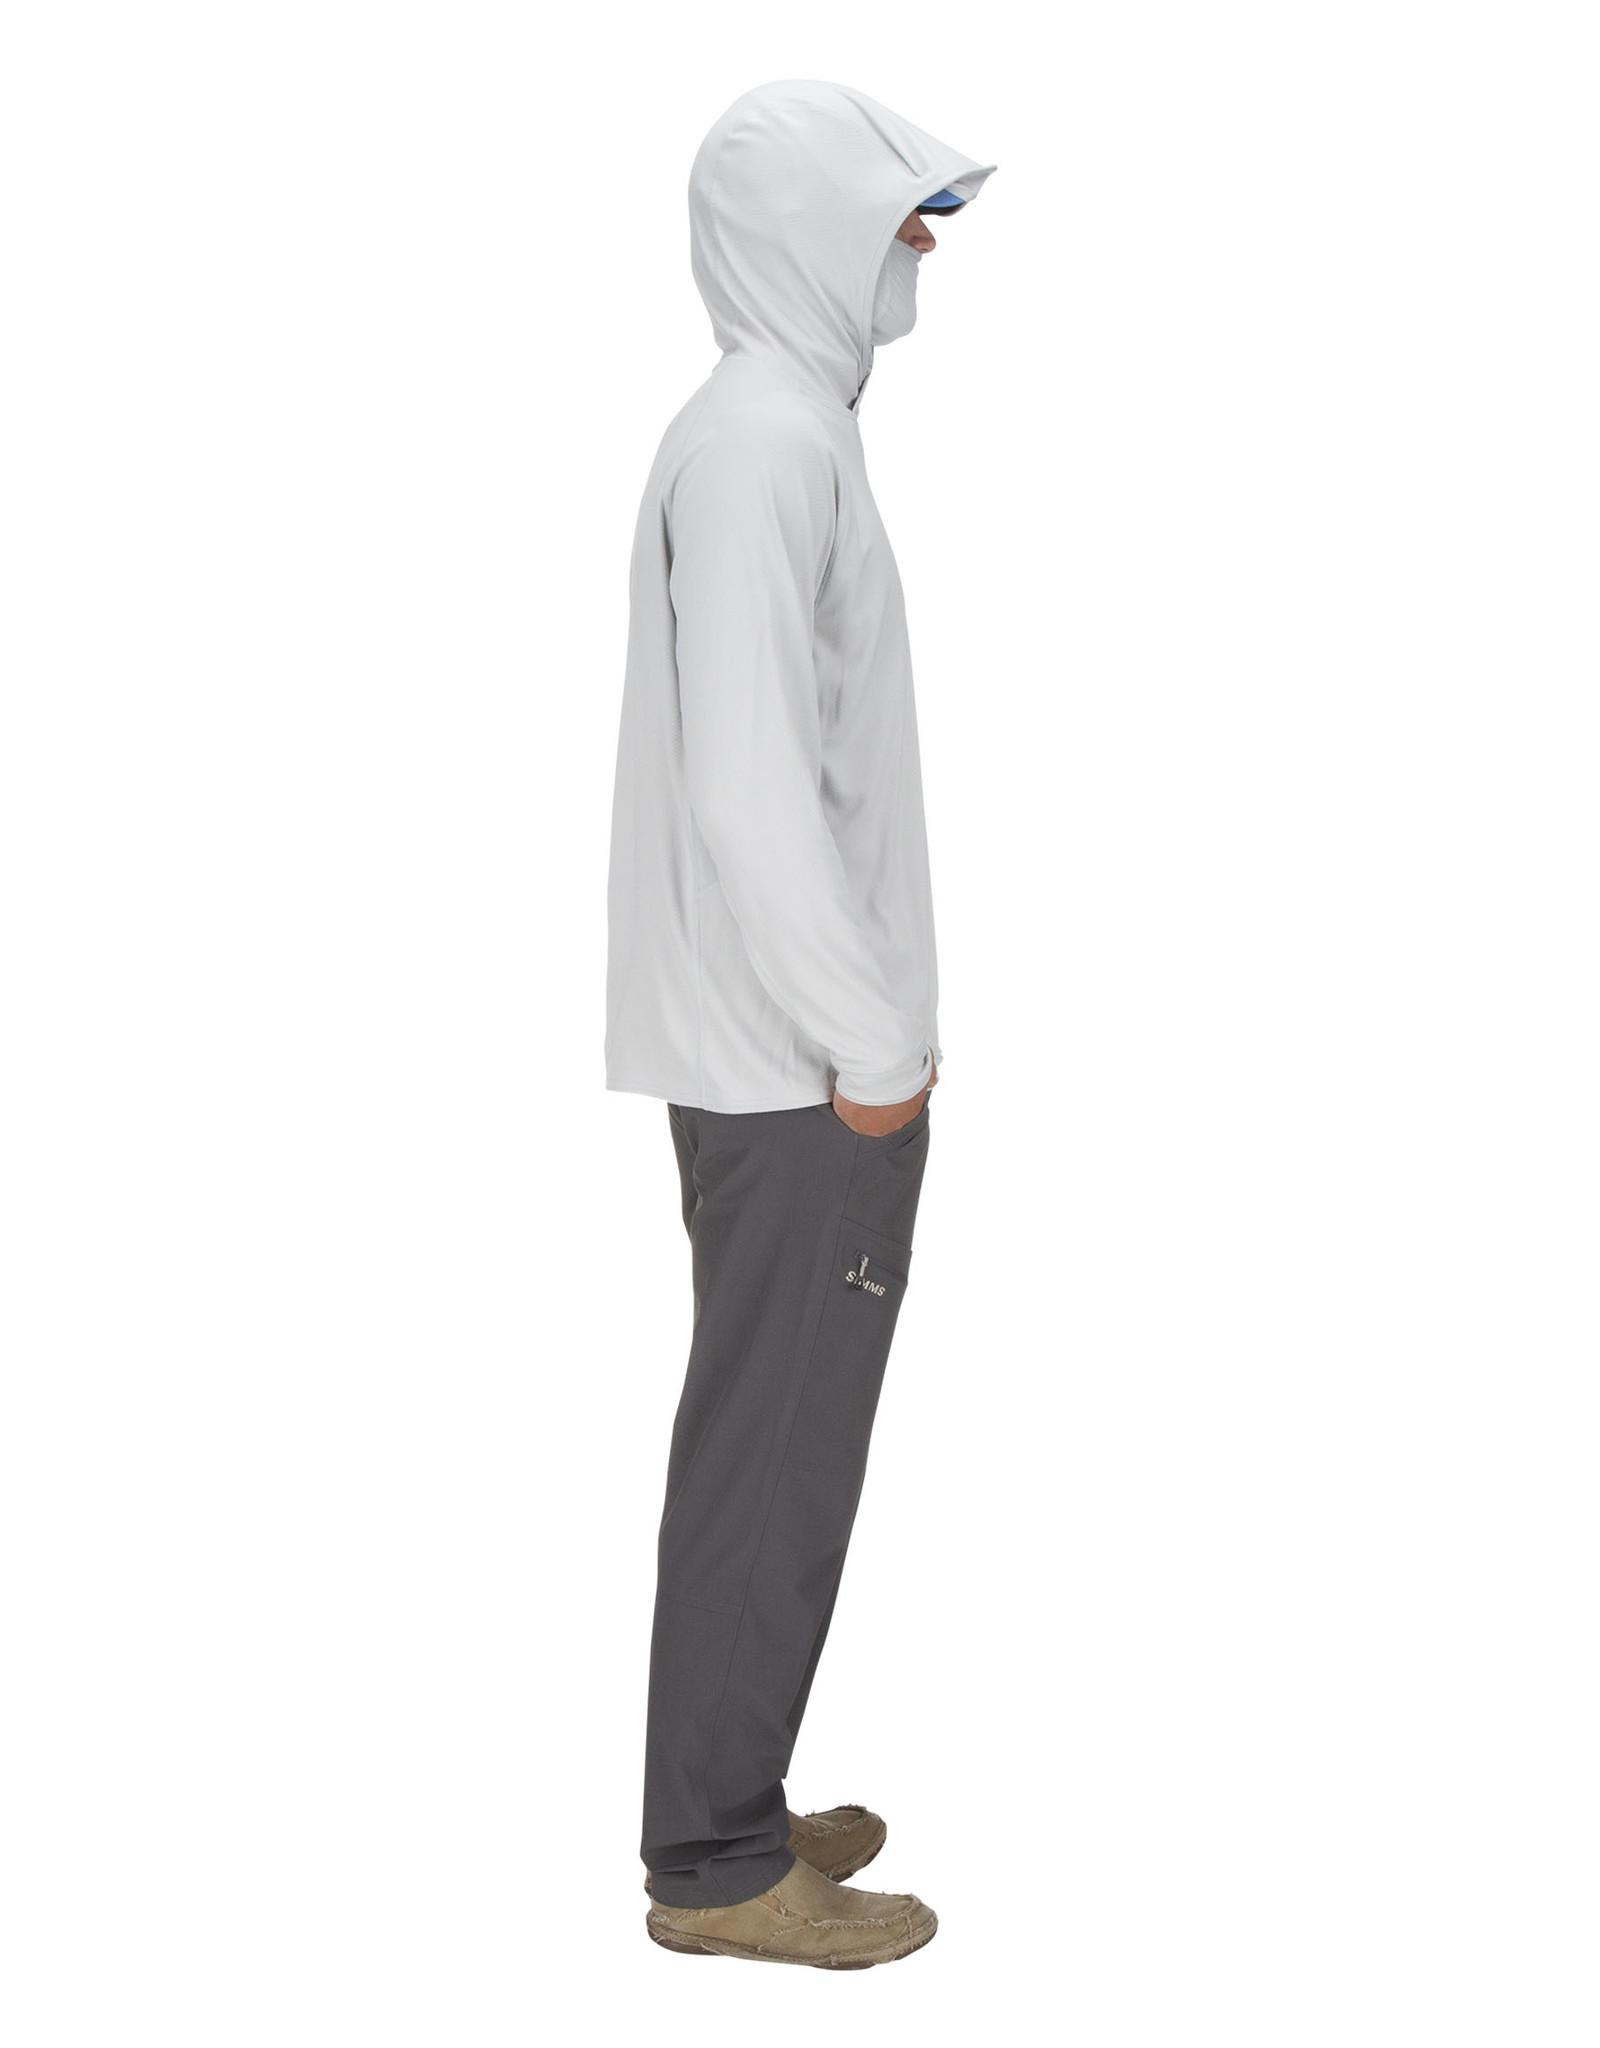 SIMMS Solarflex Ultracool Armor Hoody